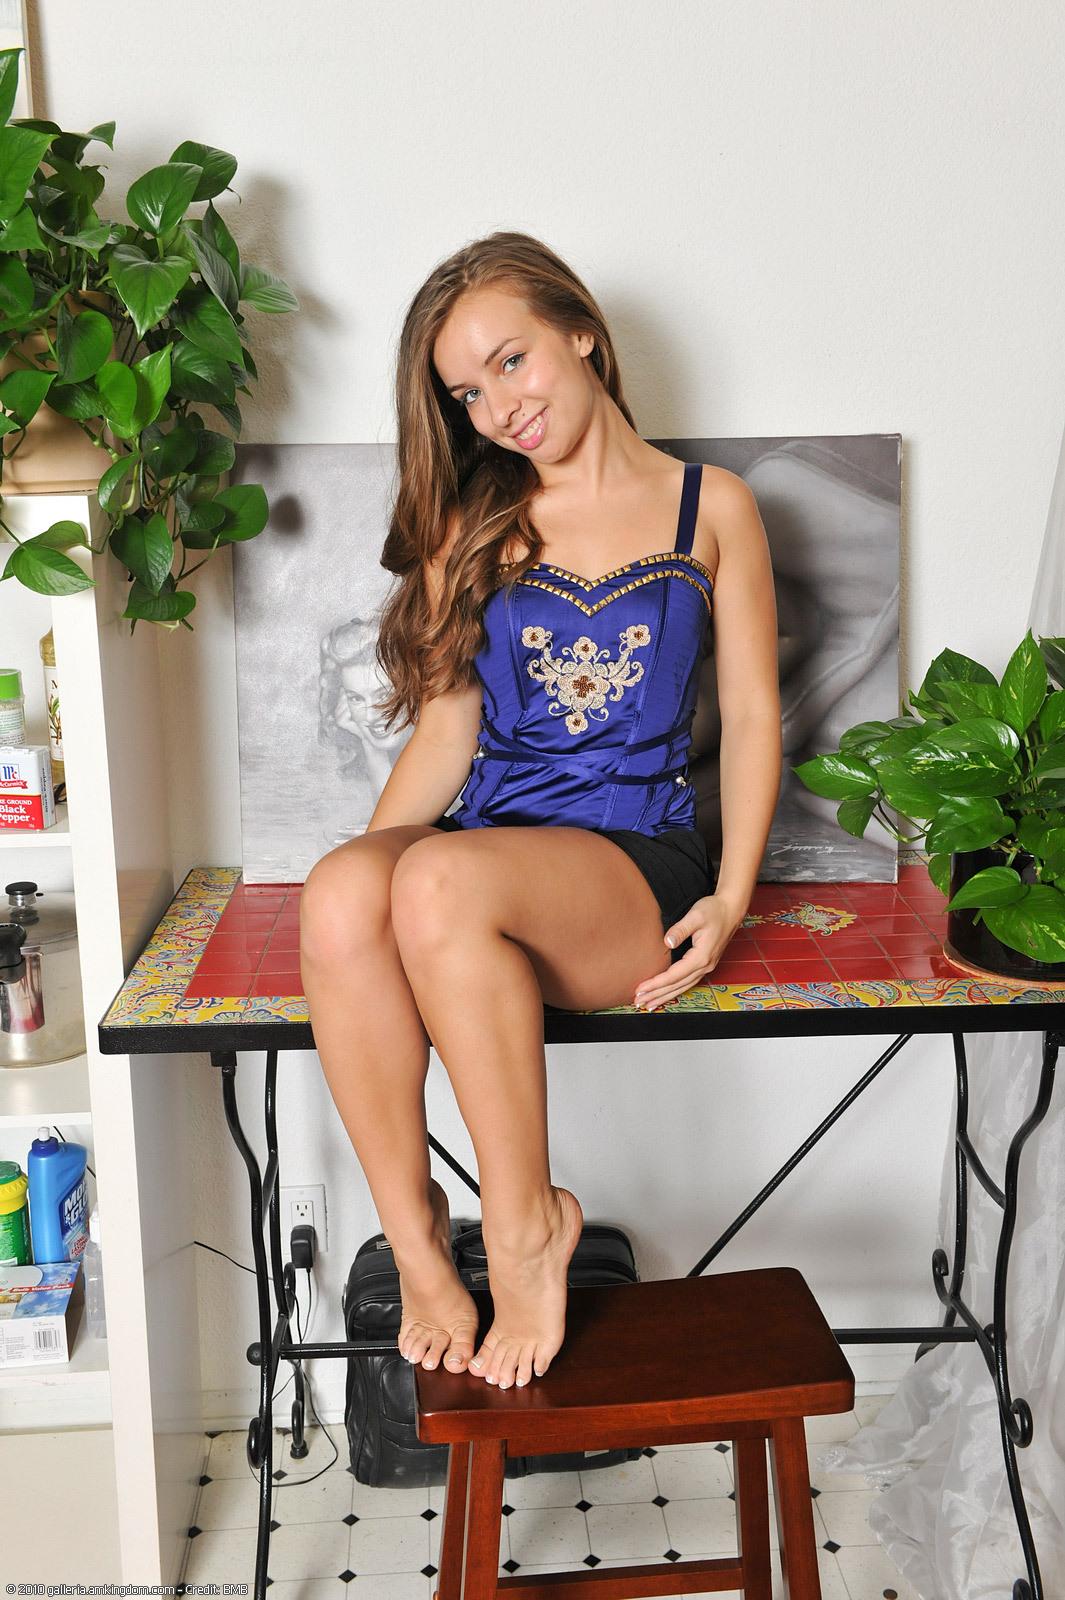 Sophia Sutras Feet